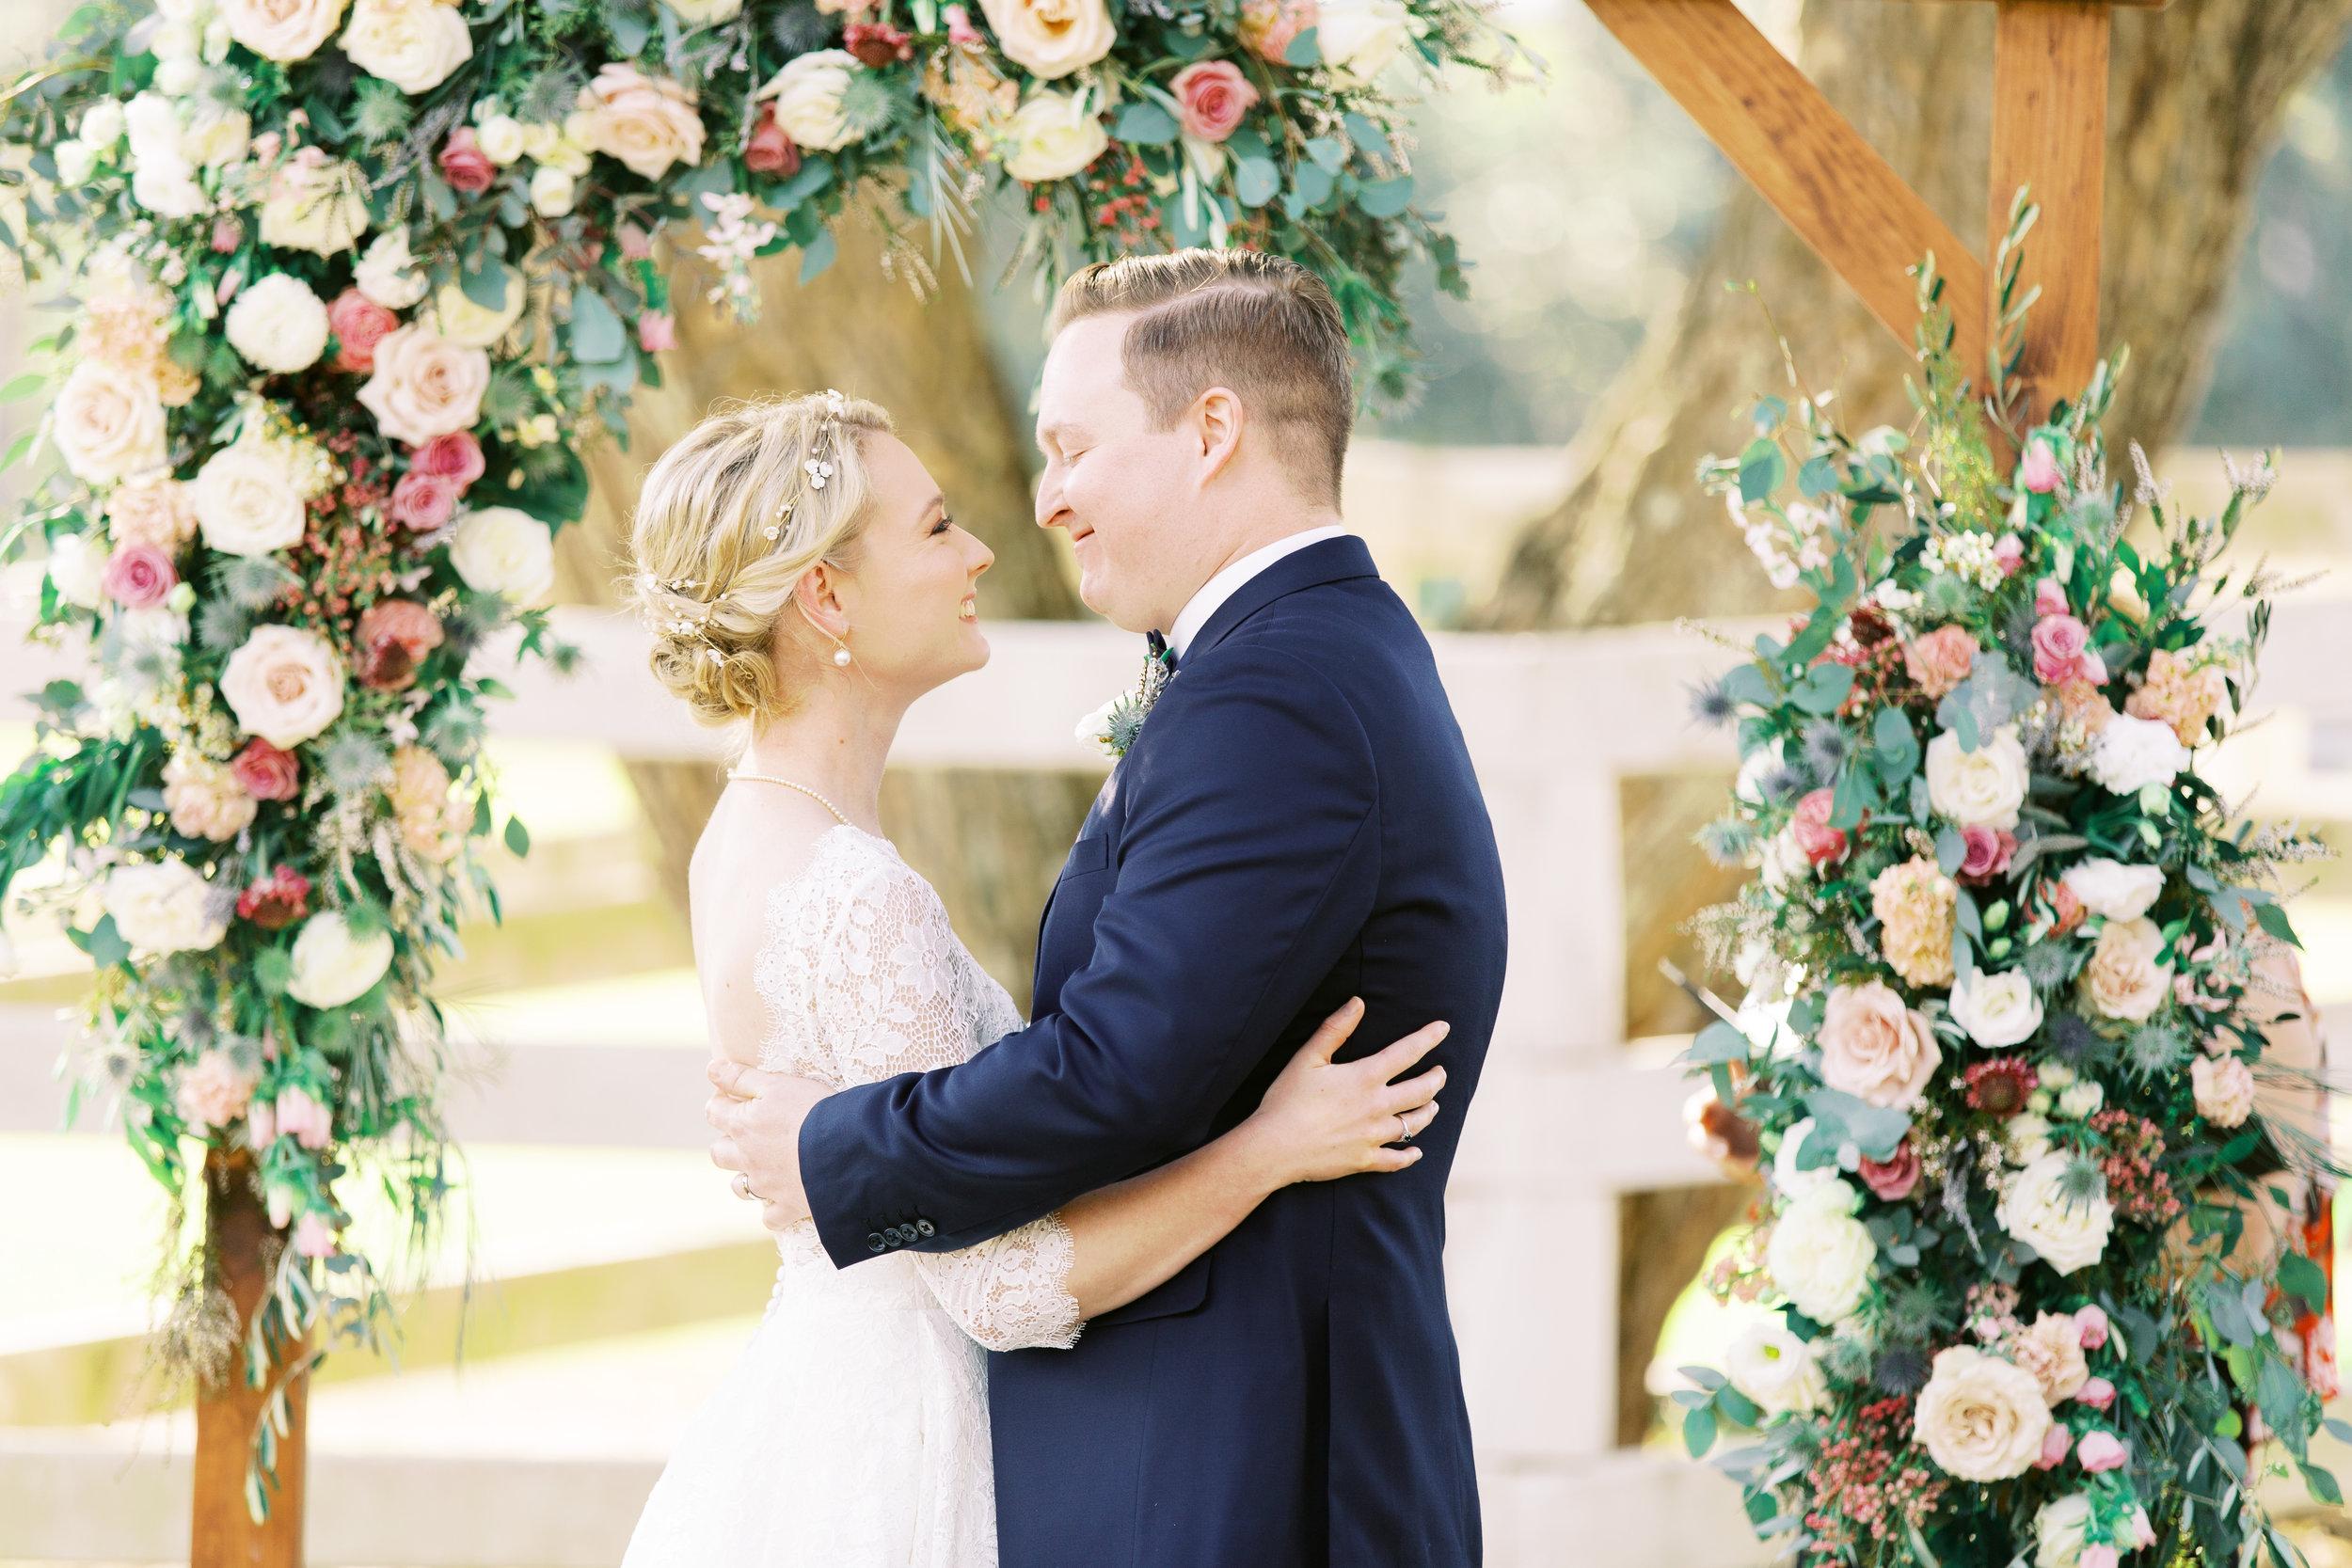 brisbane-gold-coast-sunshine-coast-tweed-romantic-fine-art-wedding-photography-lauren-olivia-30.jpg